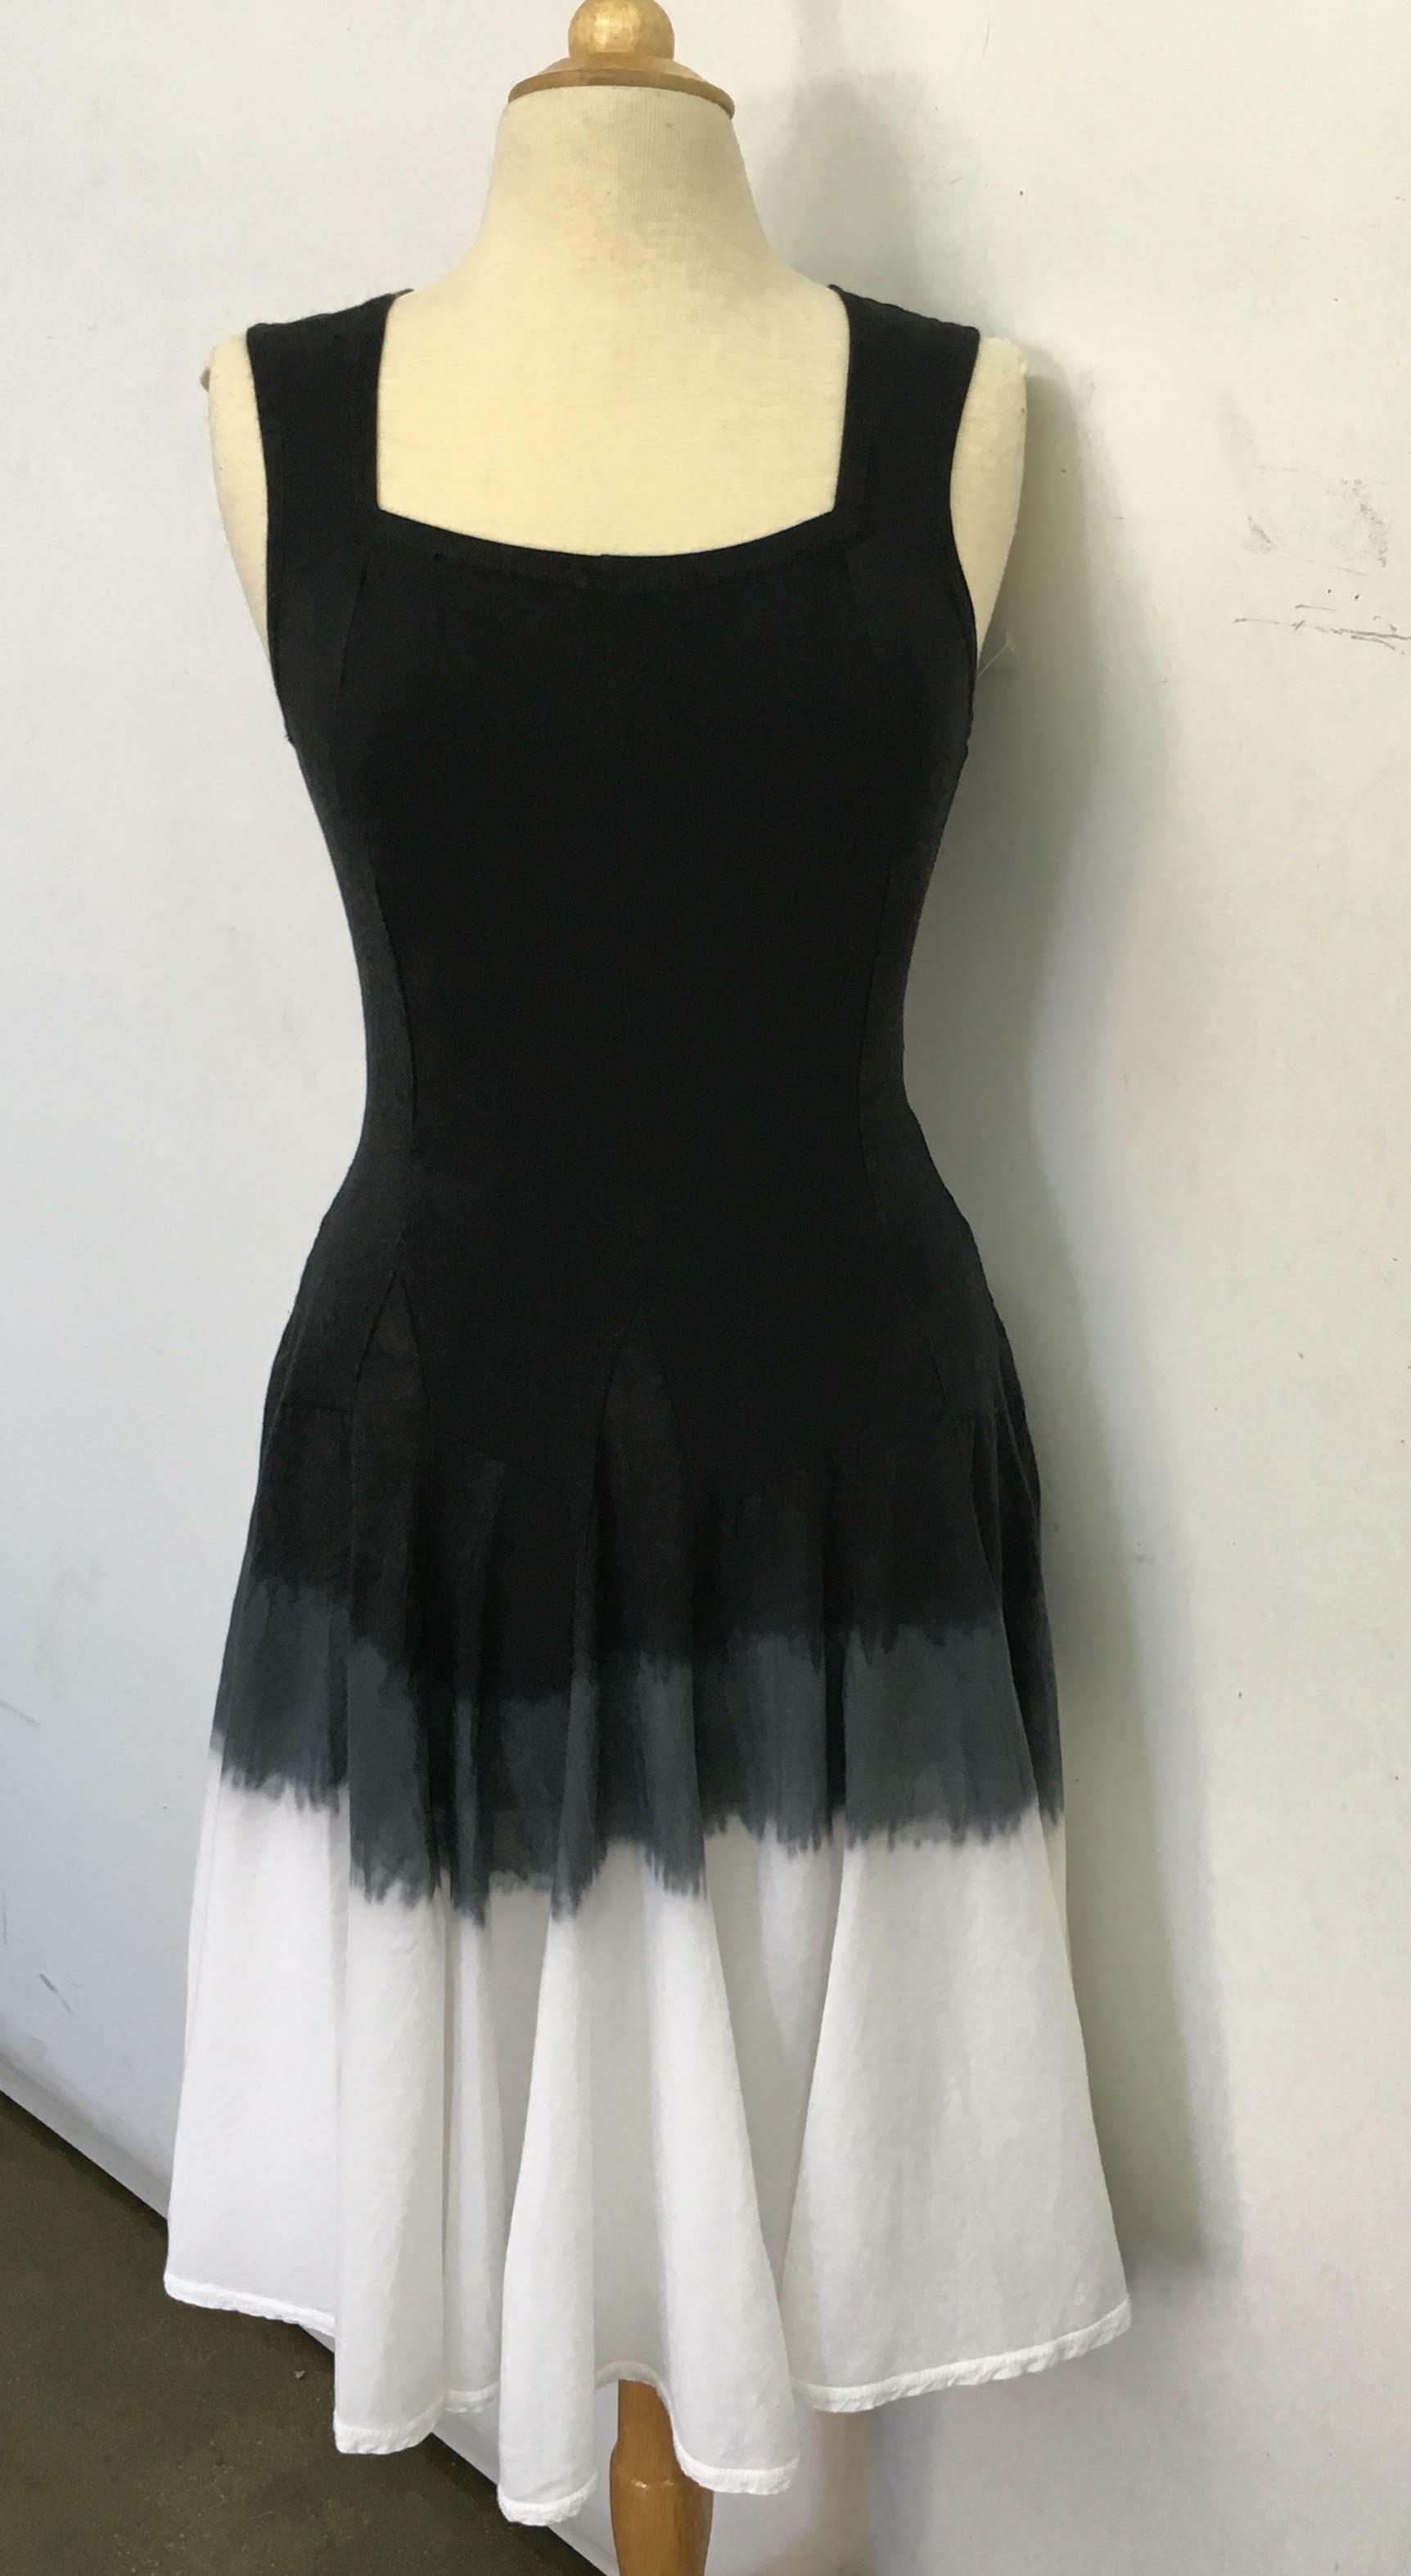 Luna Luz: Godet Dyed Black/White Ombre Square Neck Dress SOLD OUT